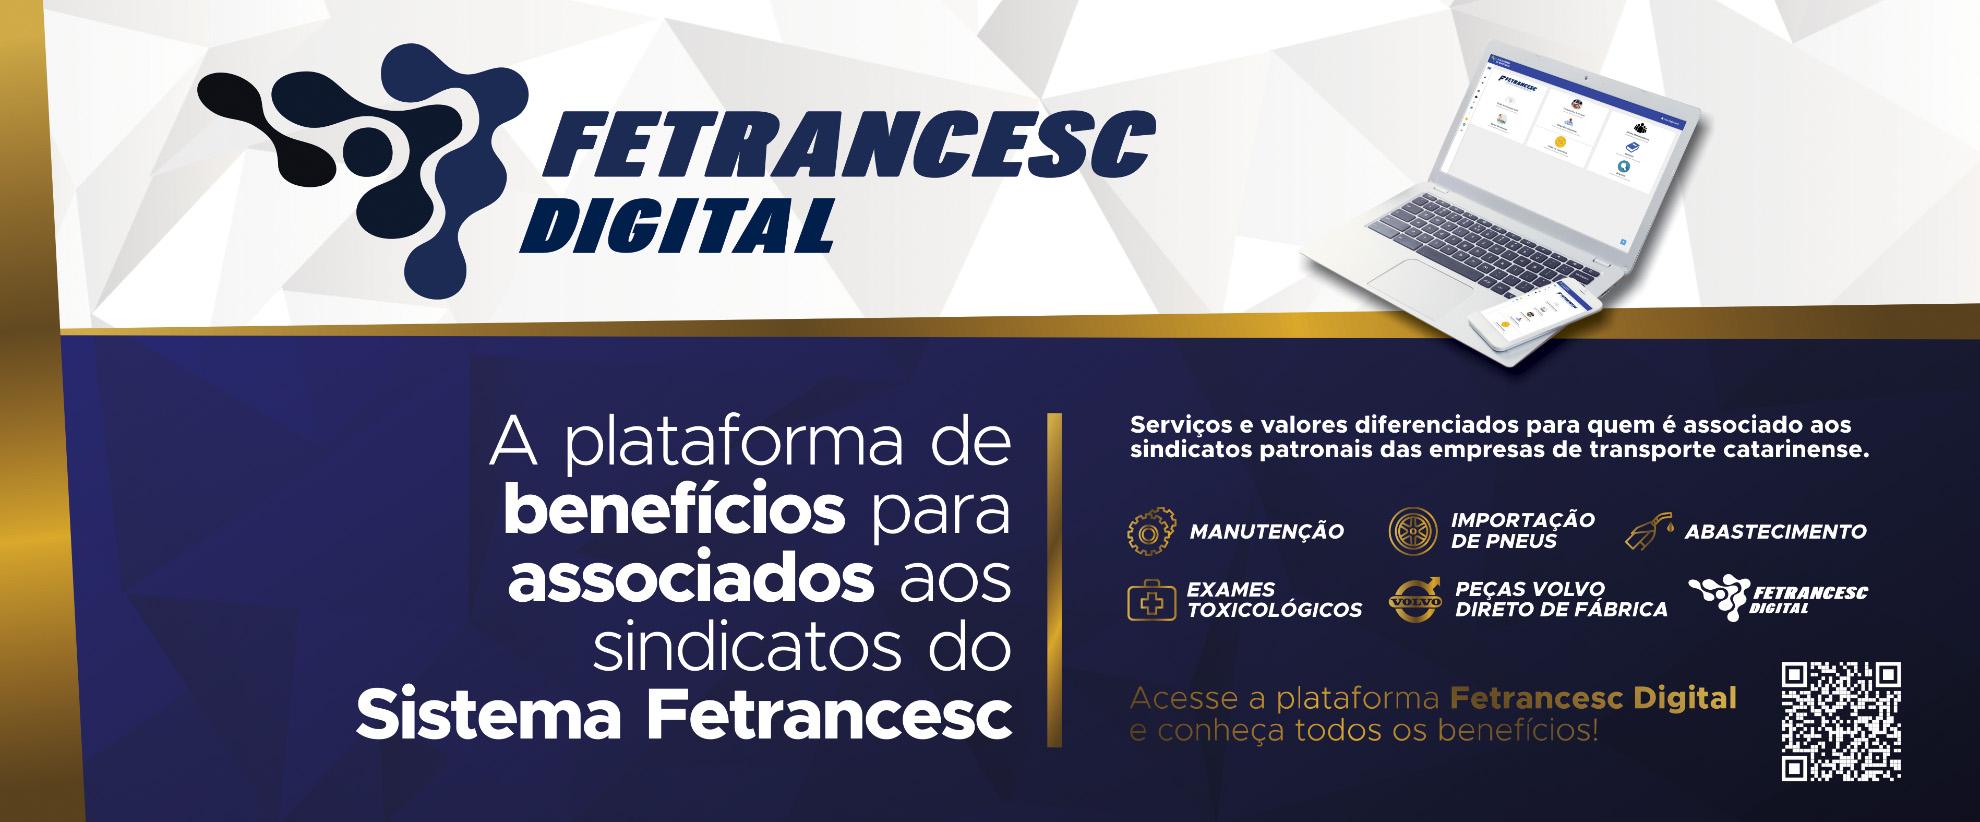 https://fetrancesc.sindicatosdigitais.com.br/clube_sindicato